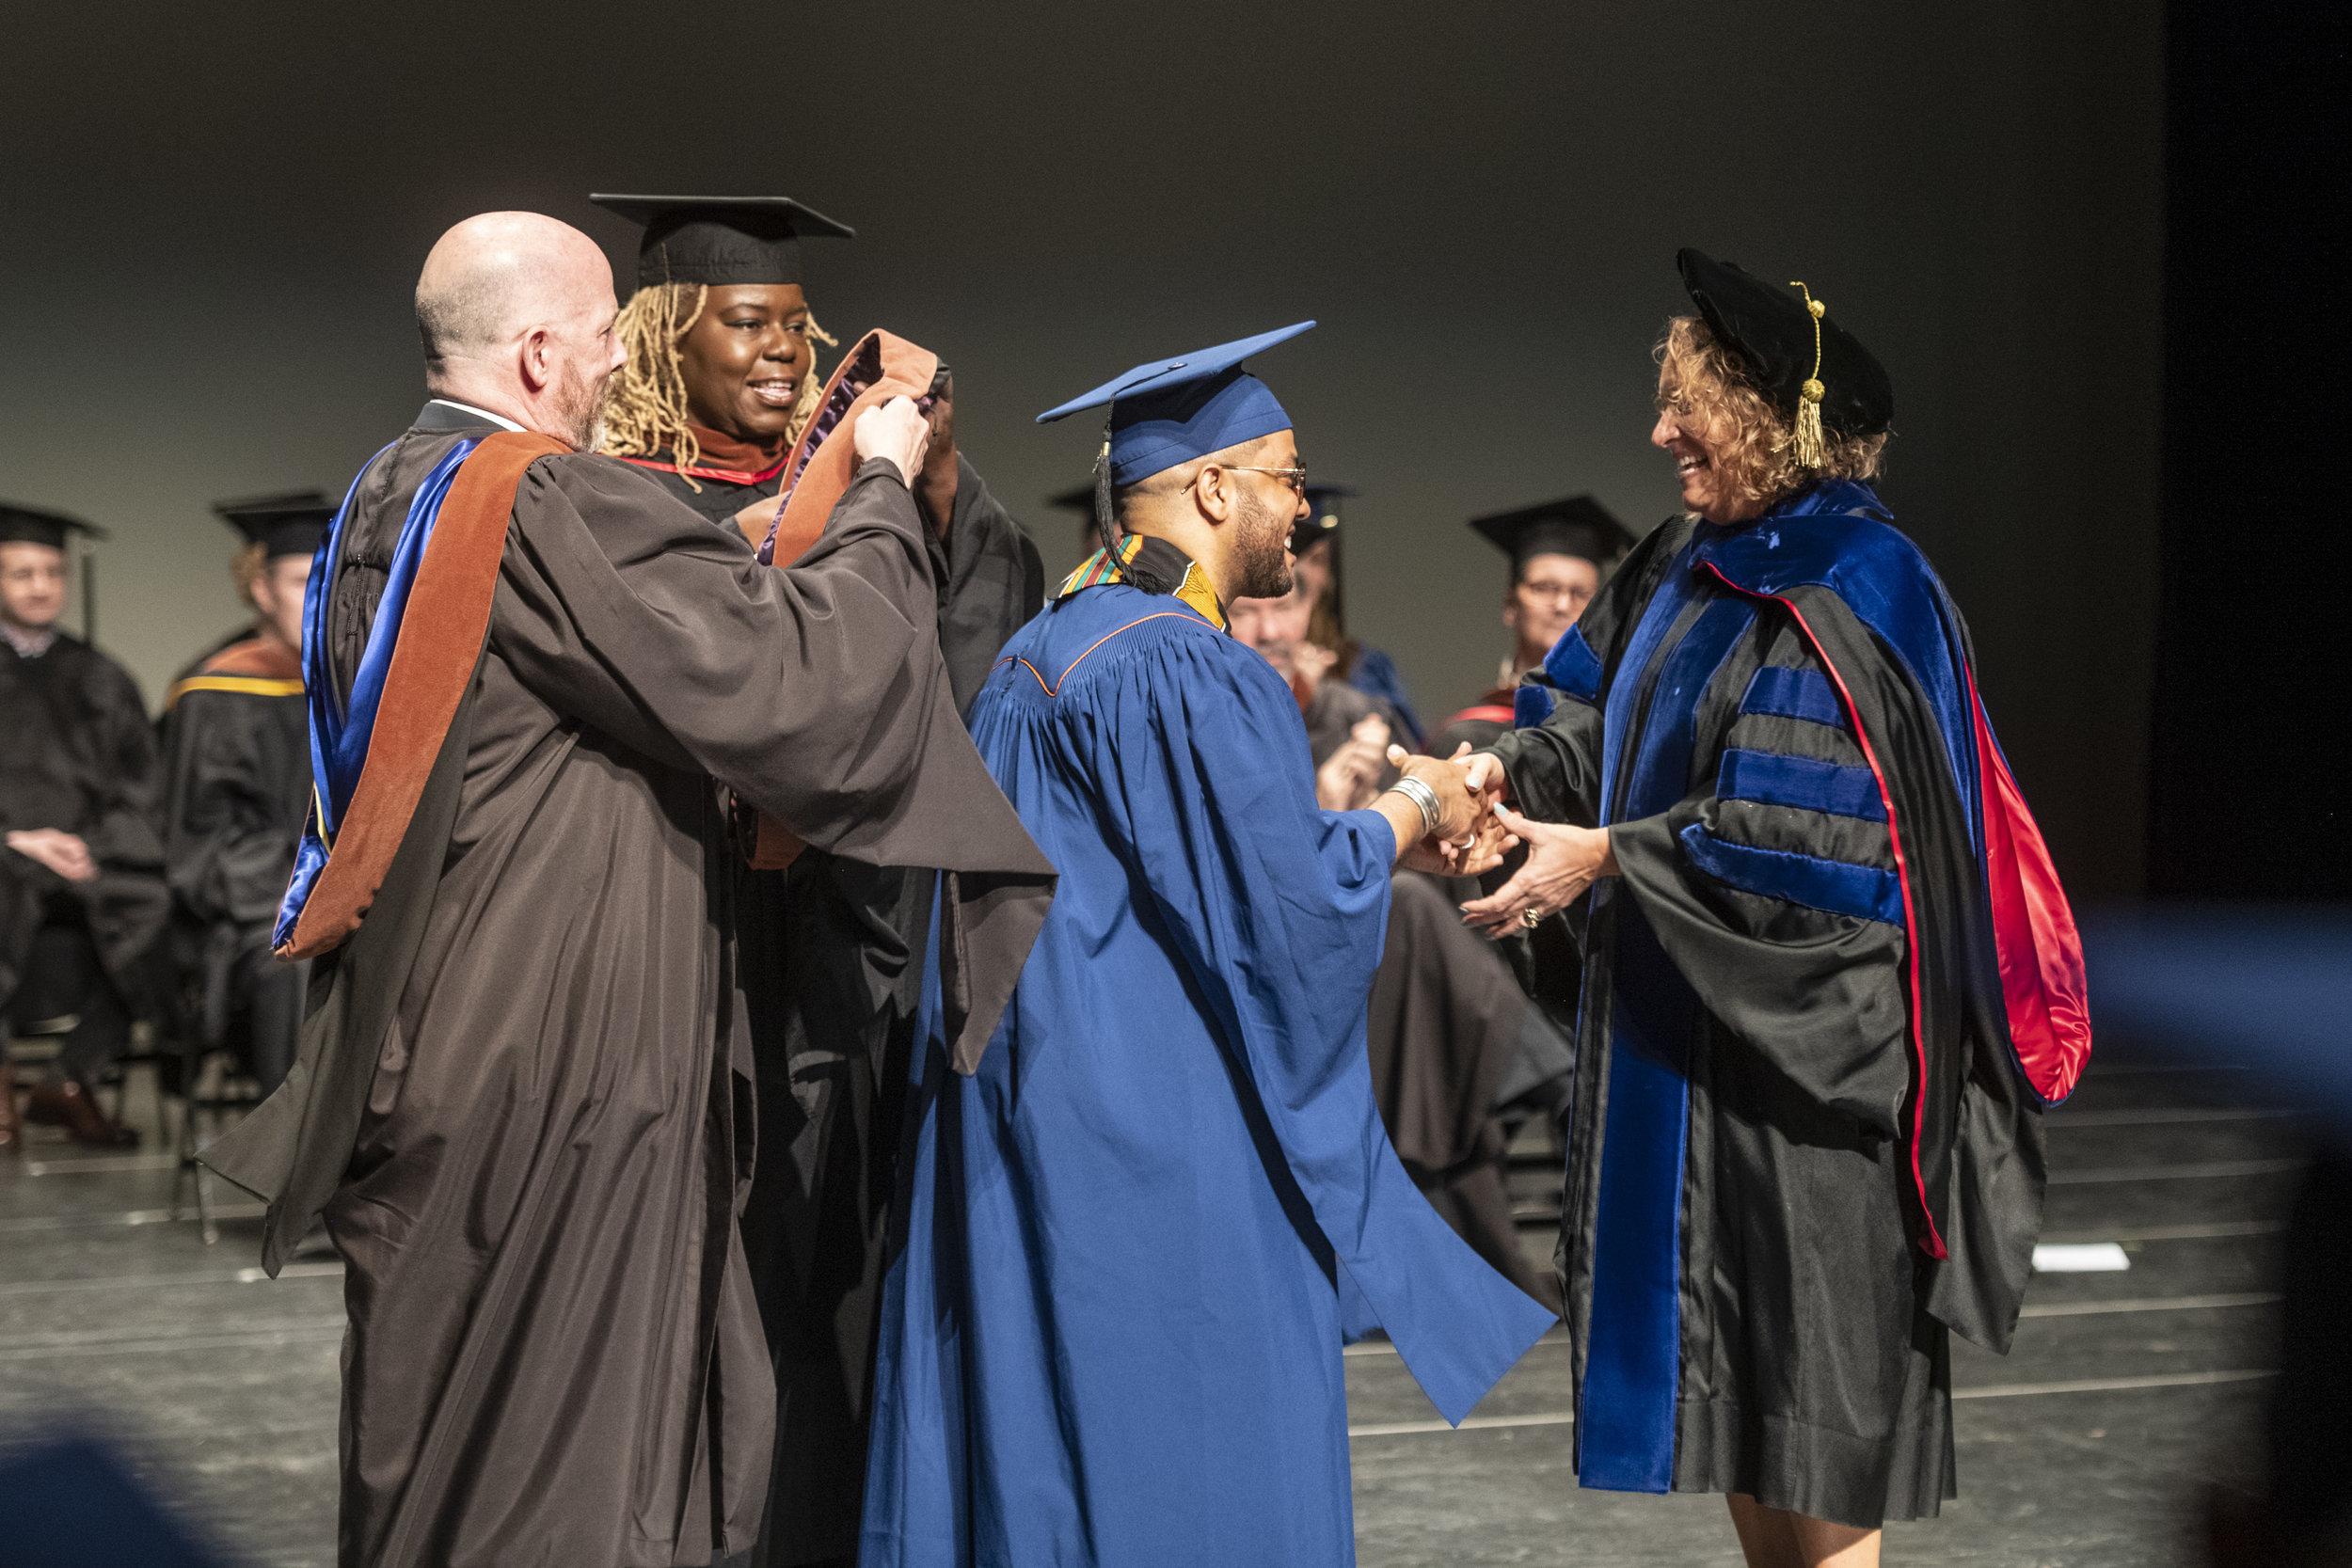 Professors Robert G. Anderson and Lisa Gaye Dixon hood Raffeal.  Photo by Darell Hoeman